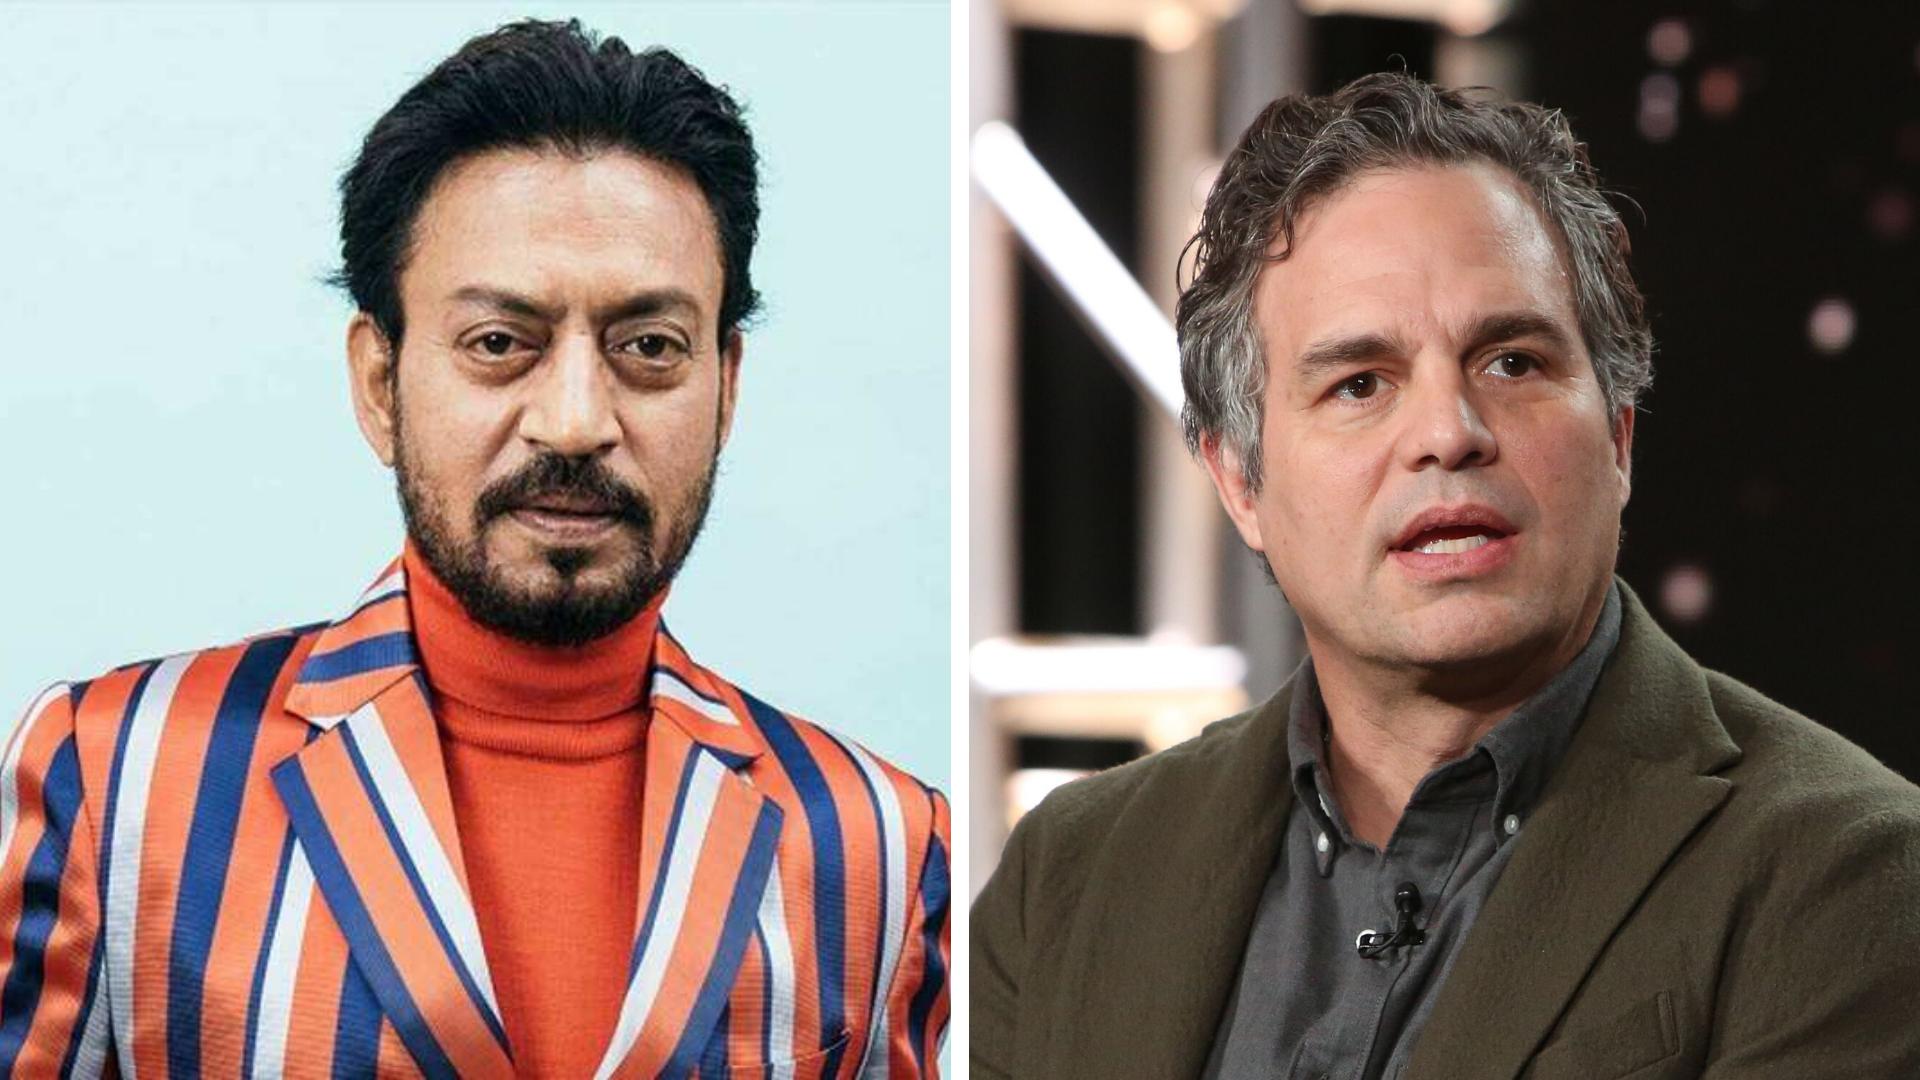 Hey Man, I Love Your Work: When Mark Ruffalo Praised Irrfan Khan thumbnail